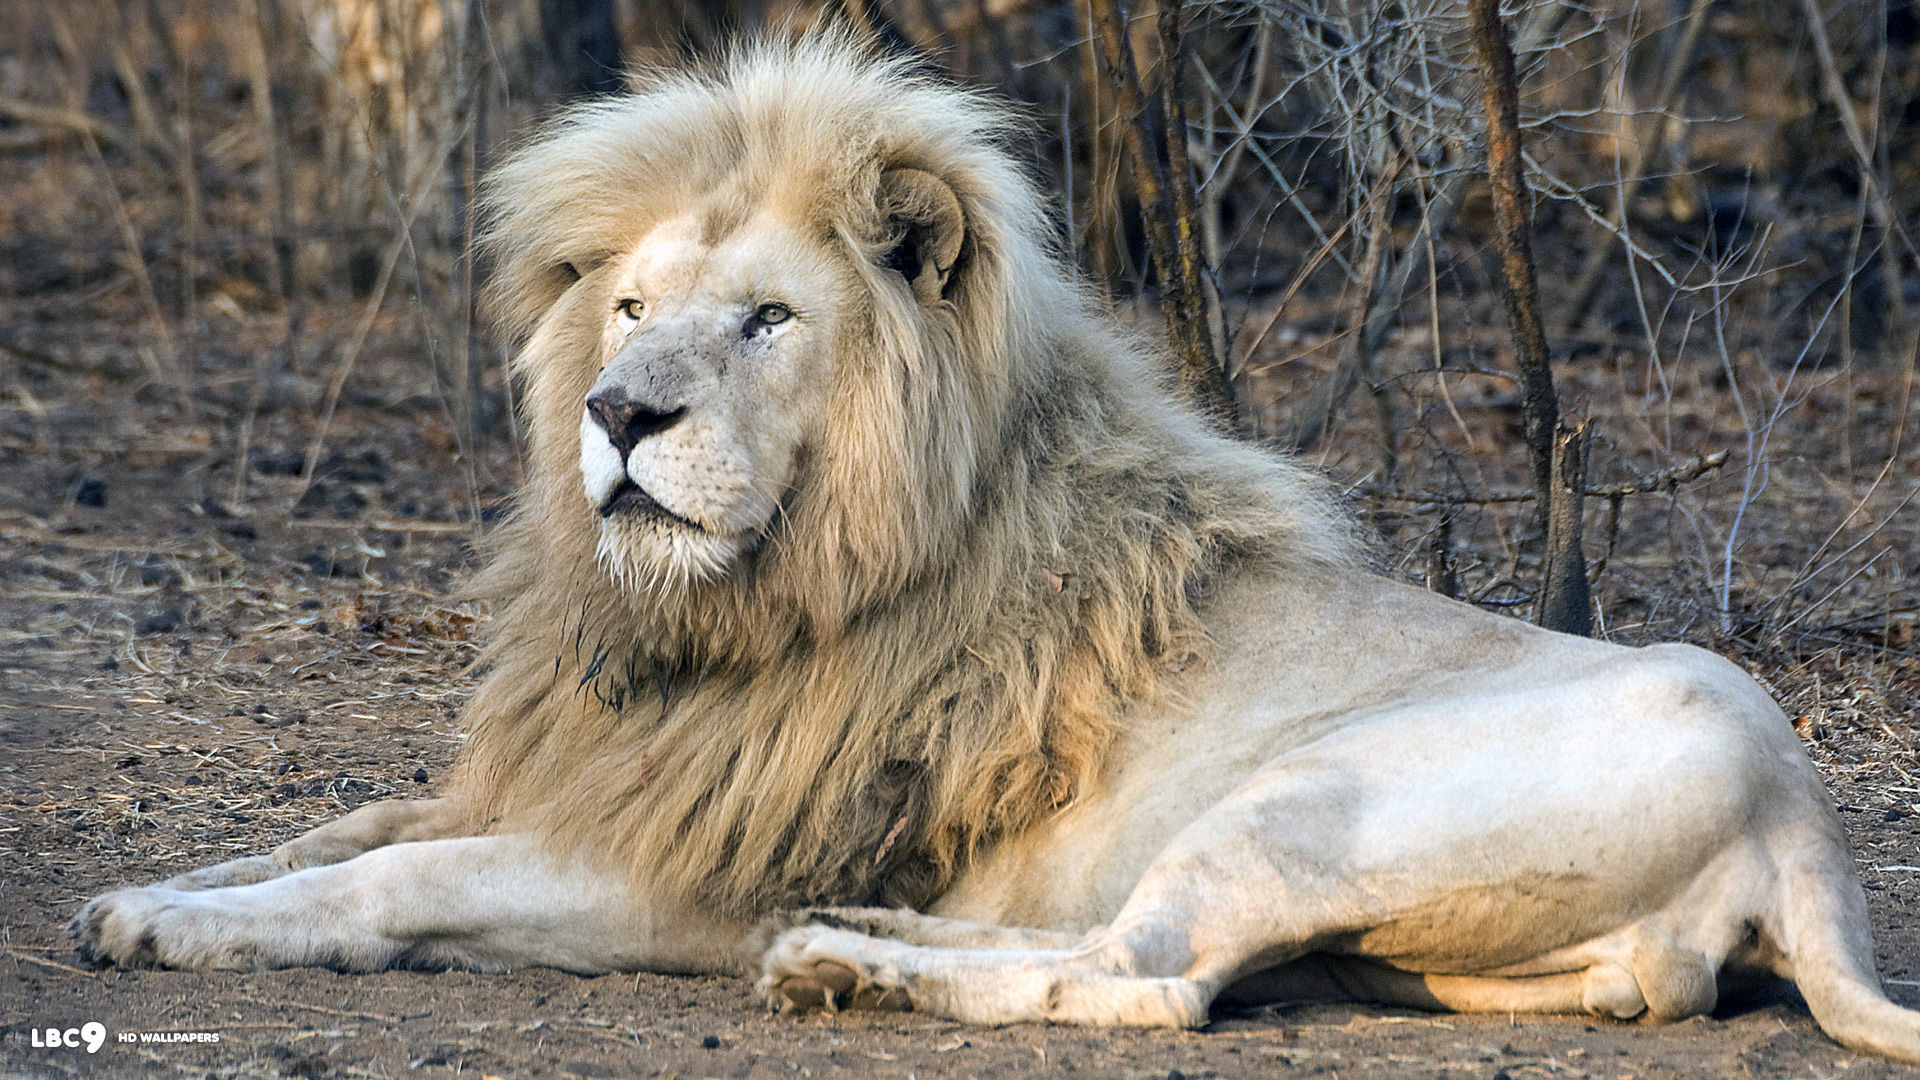 Angry Lion Wallpaper Hd 1080p Lion Wallpaper Desktop 68 Images